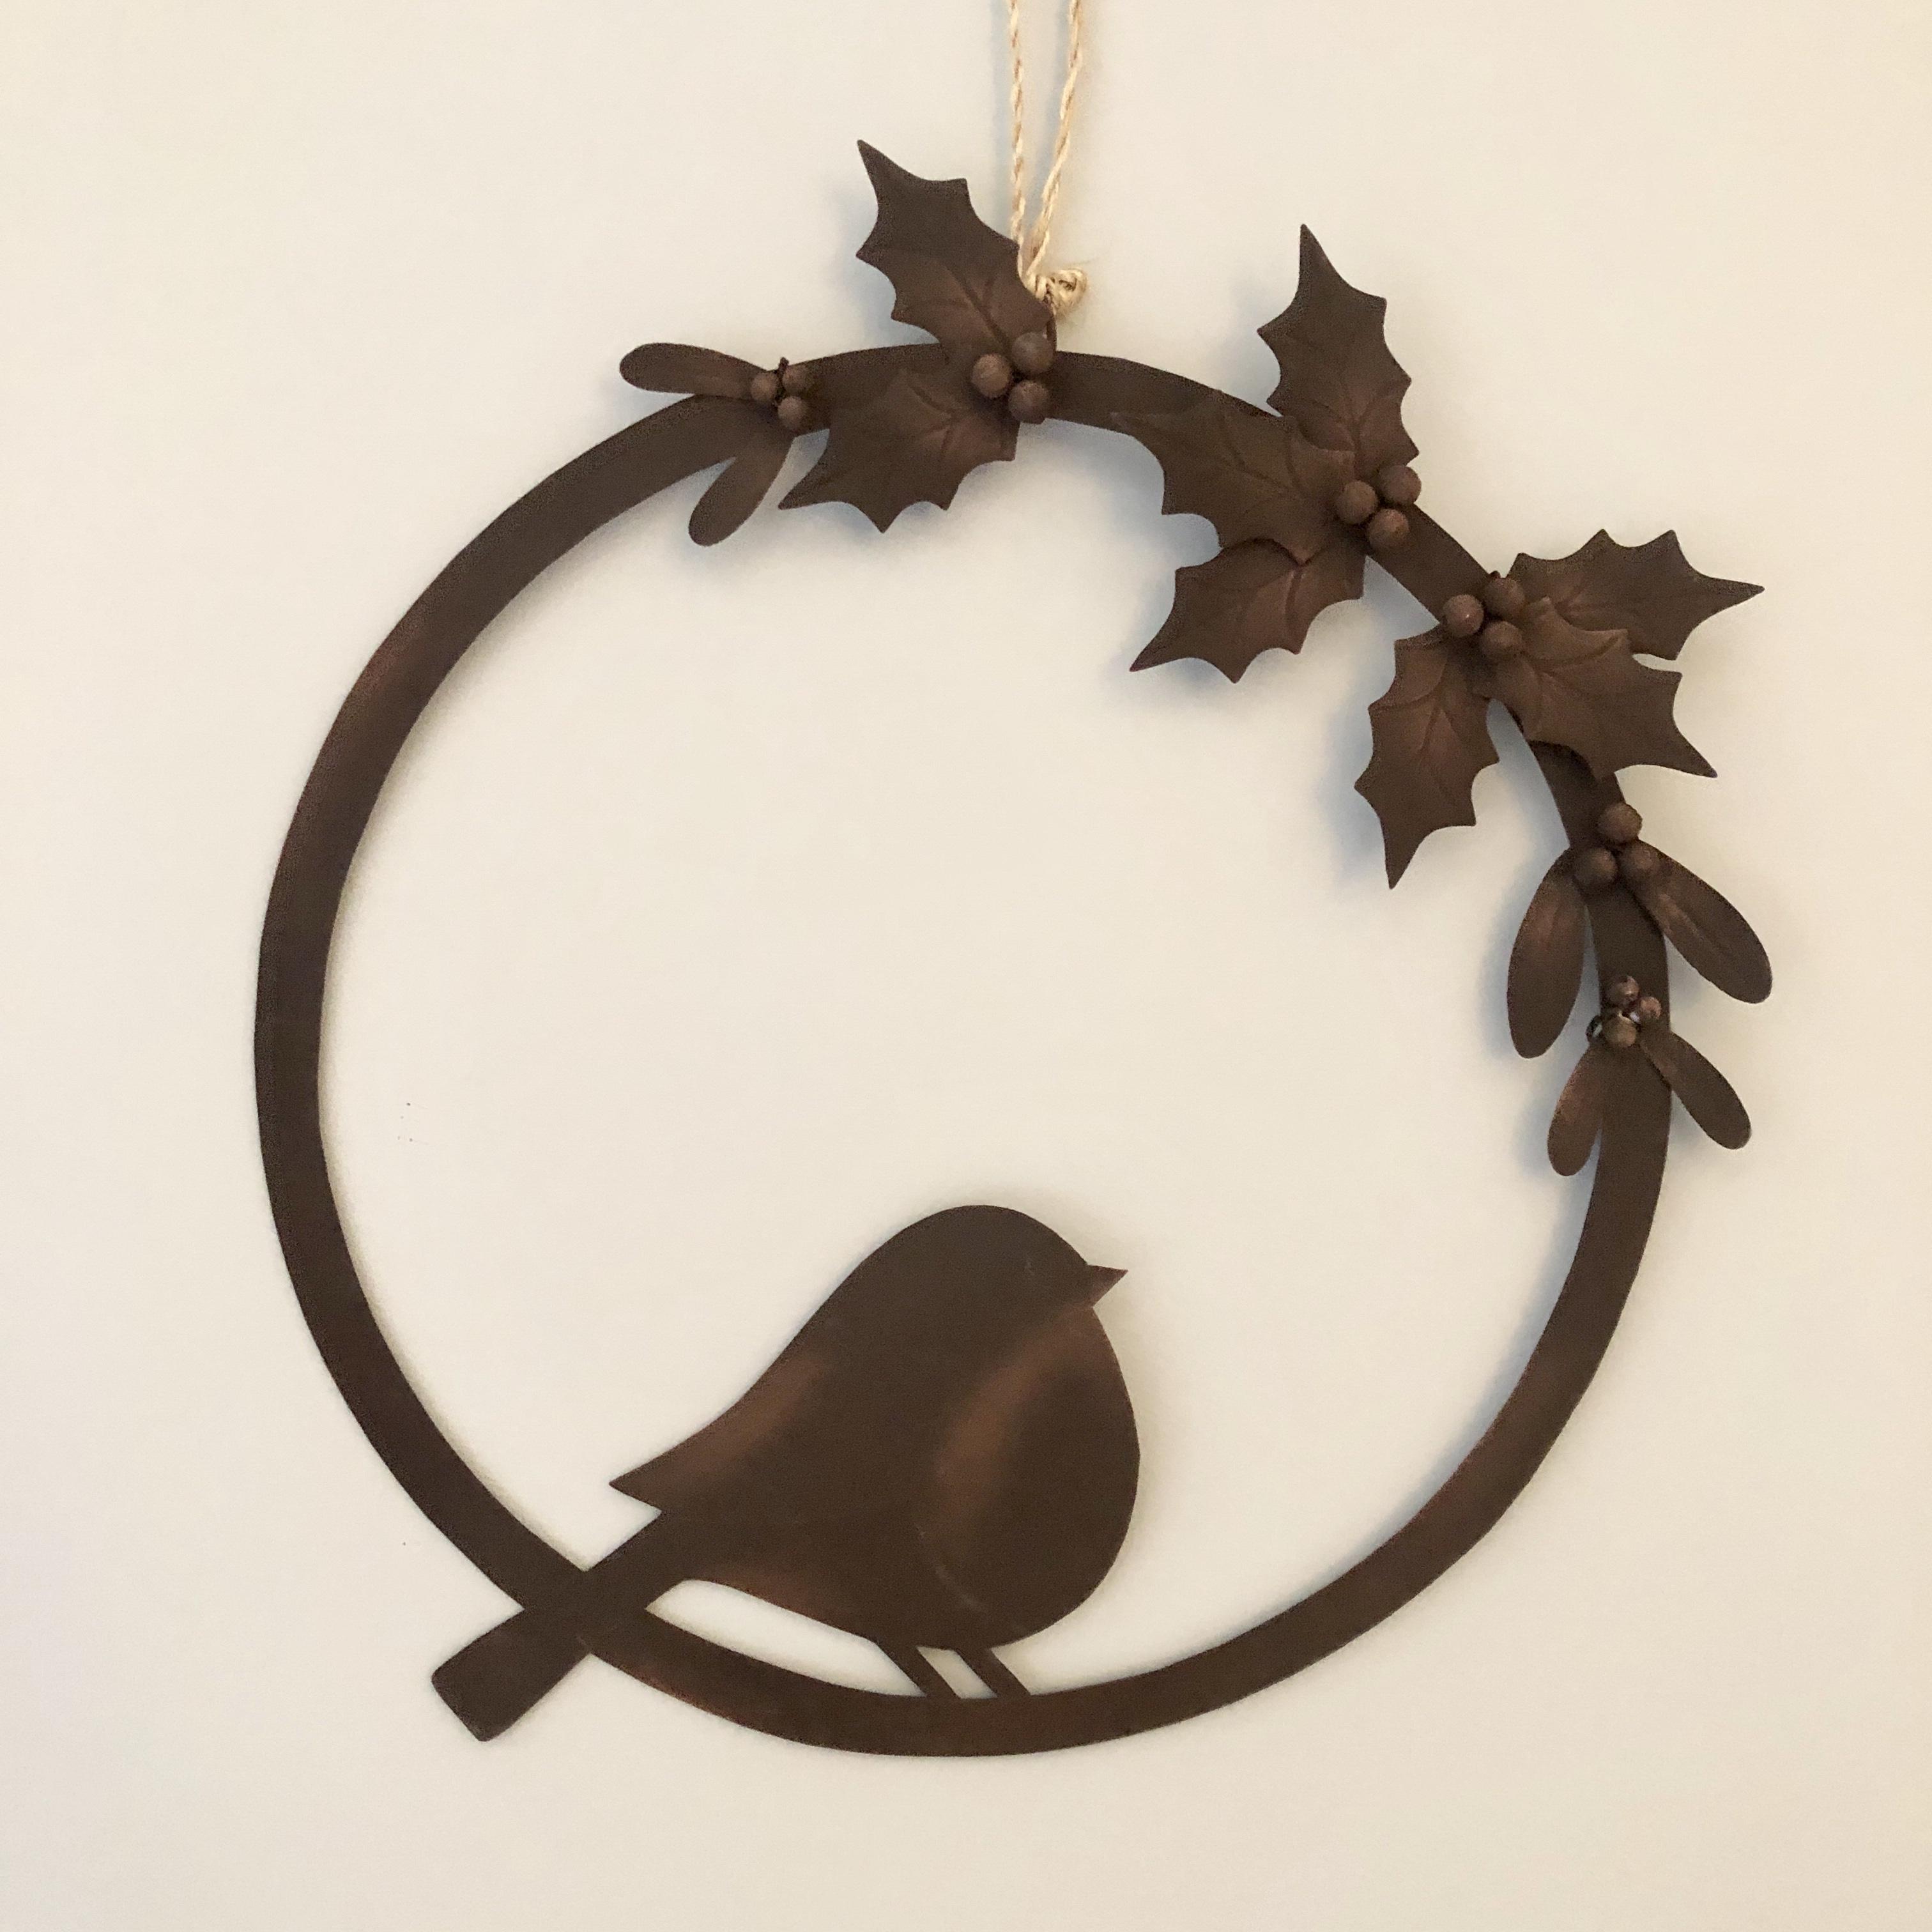 Yuletide robin wreath Christmas decoration by shoeless joe